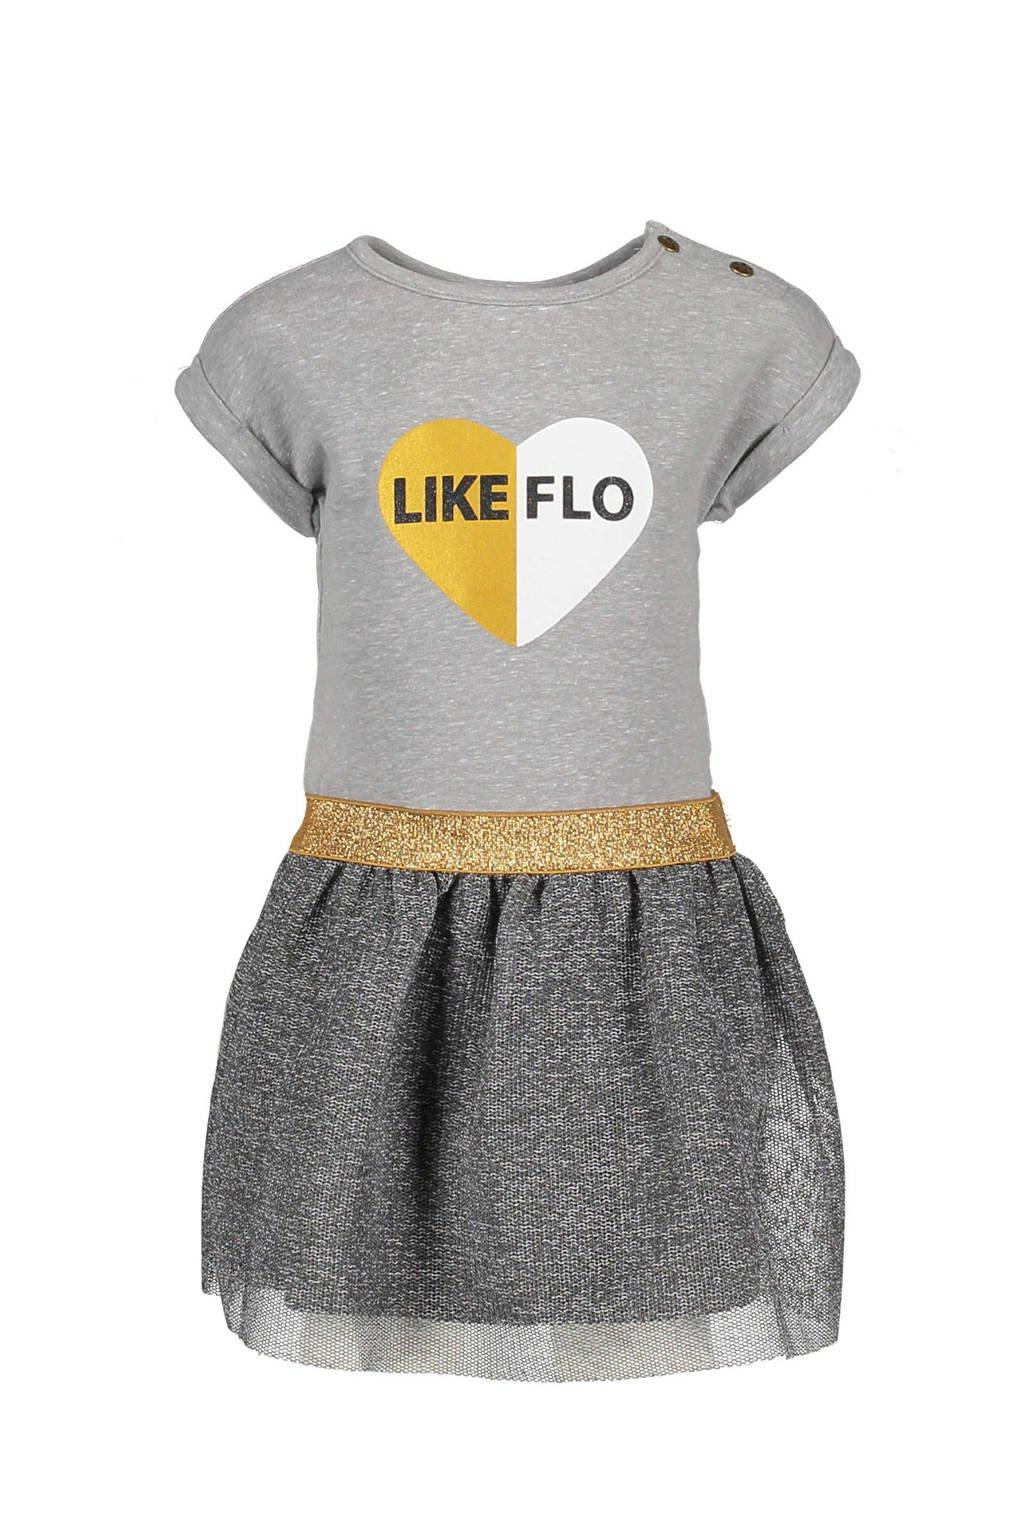 Like Flo jurk met transparante rok en print grijs, Grijs/donkergrijs